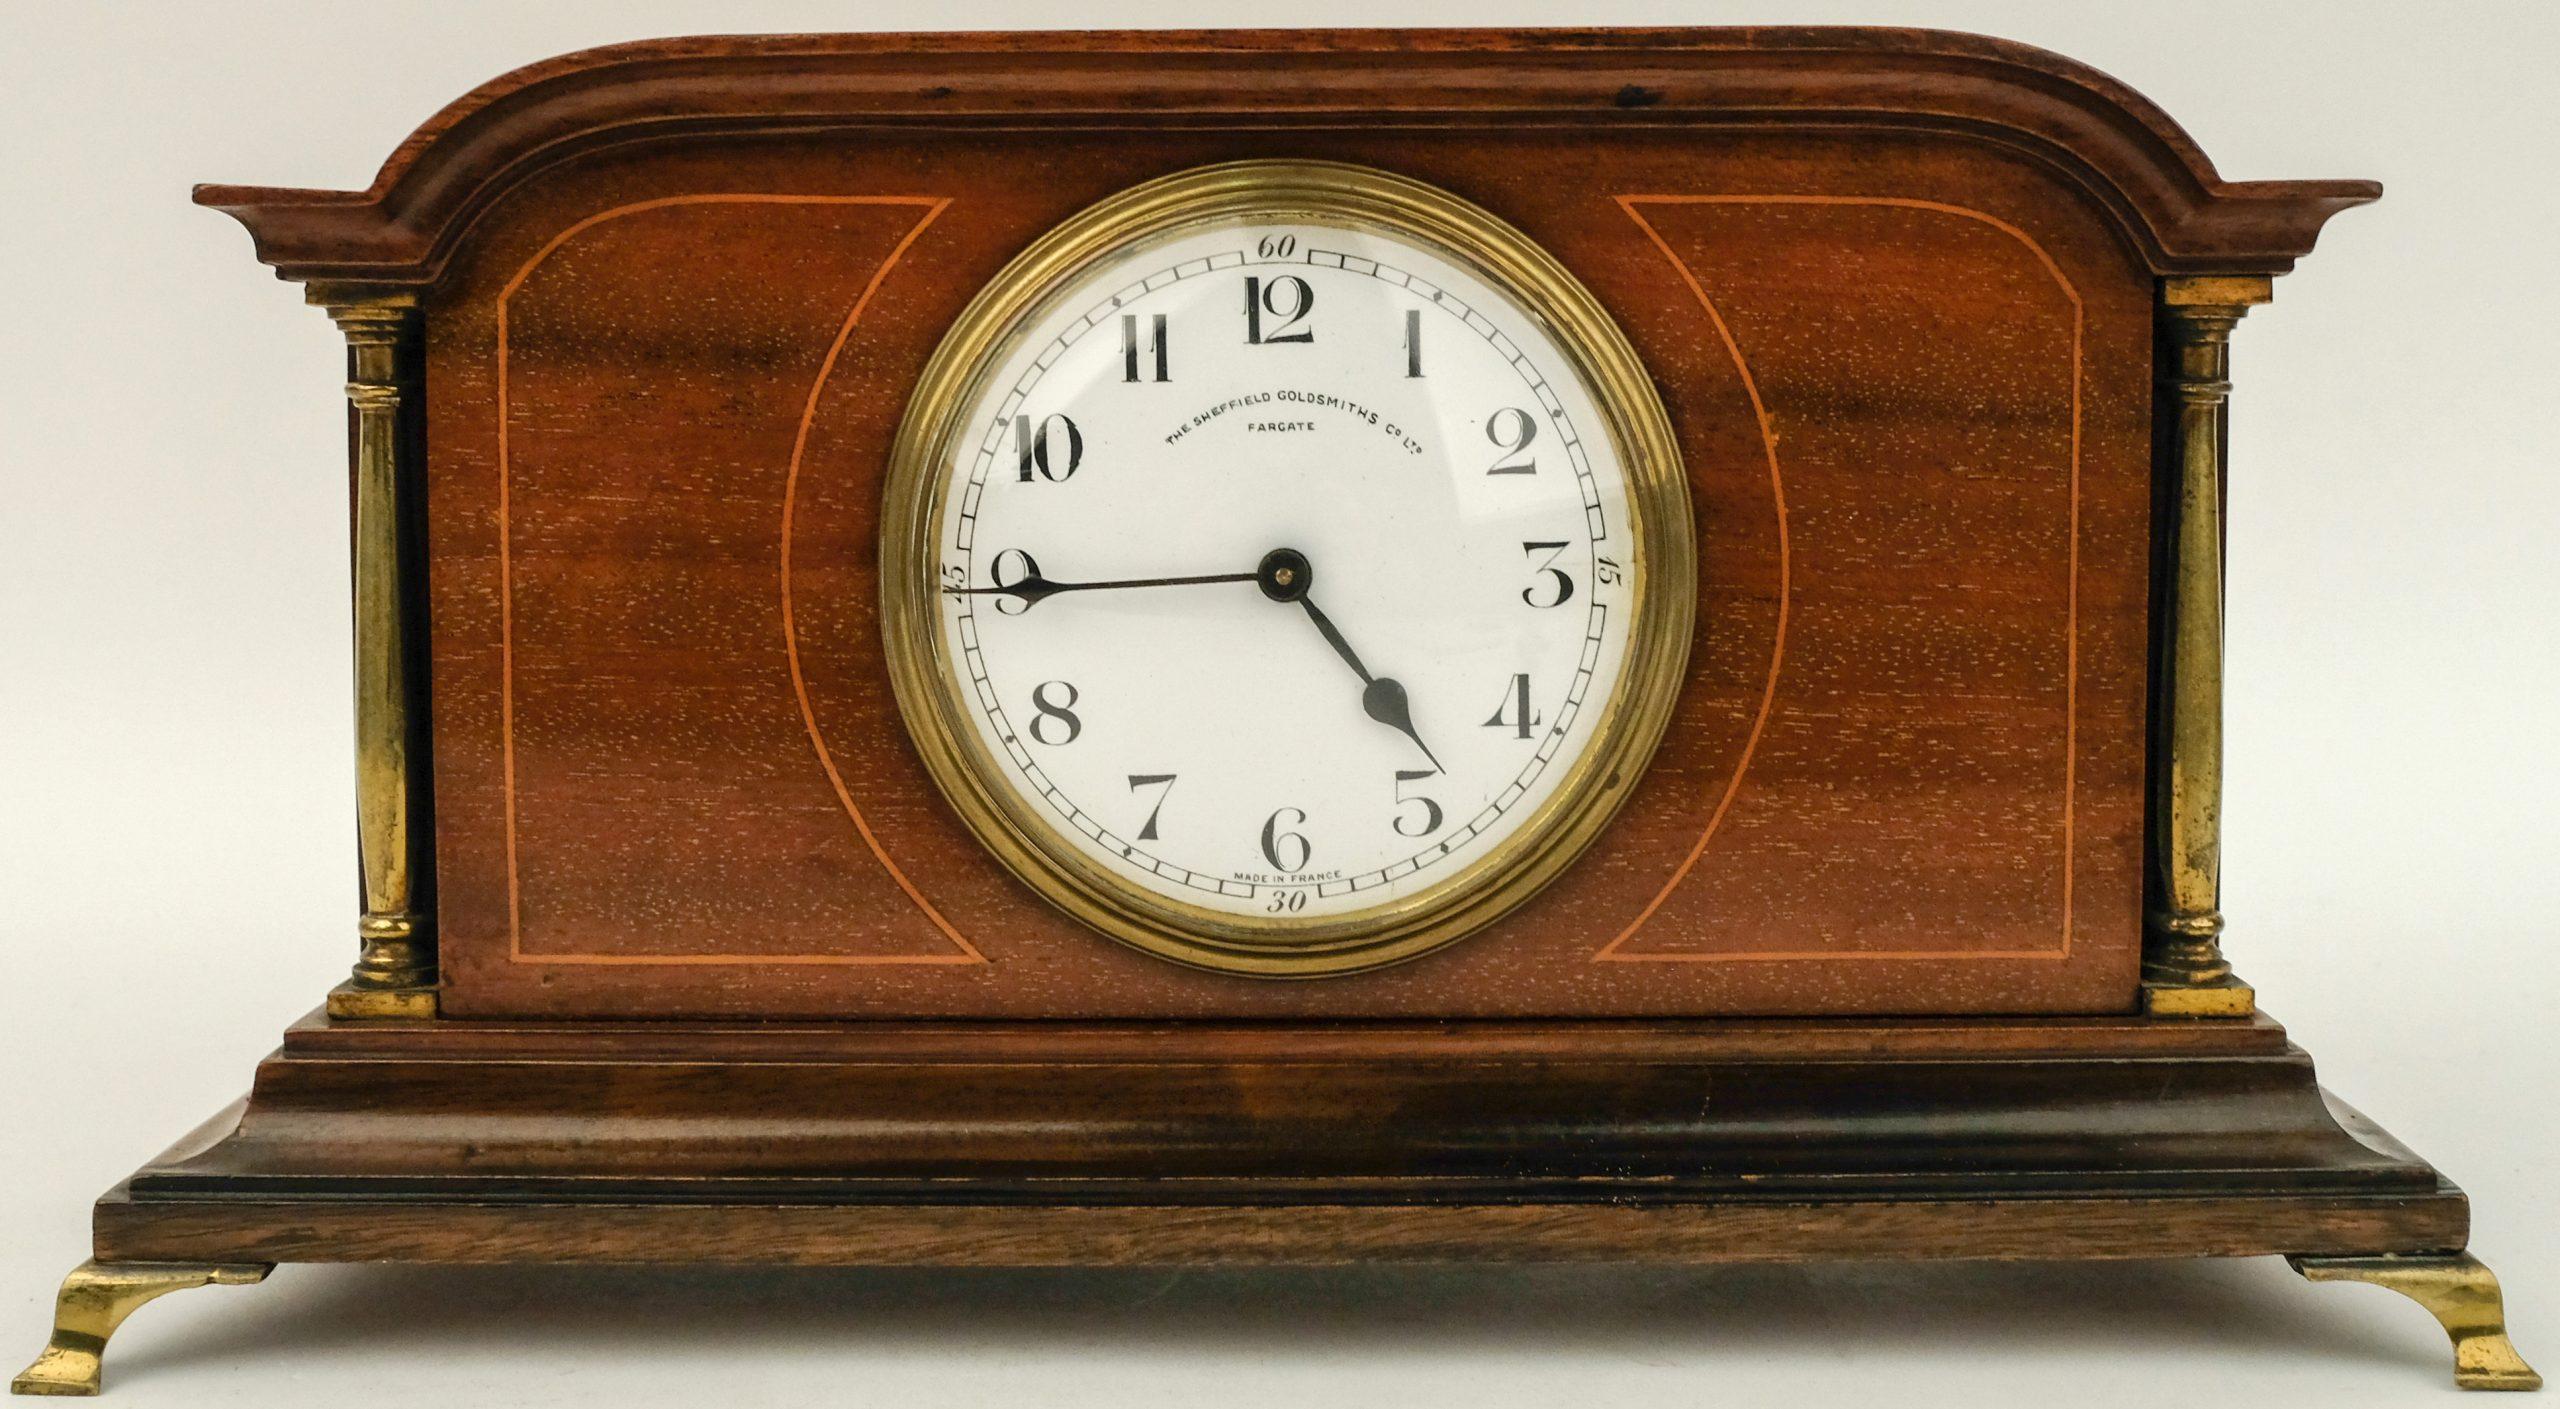 Klokje, wijzerplaat gemerkt met Sheffield Goldsmiths Co. Ltd